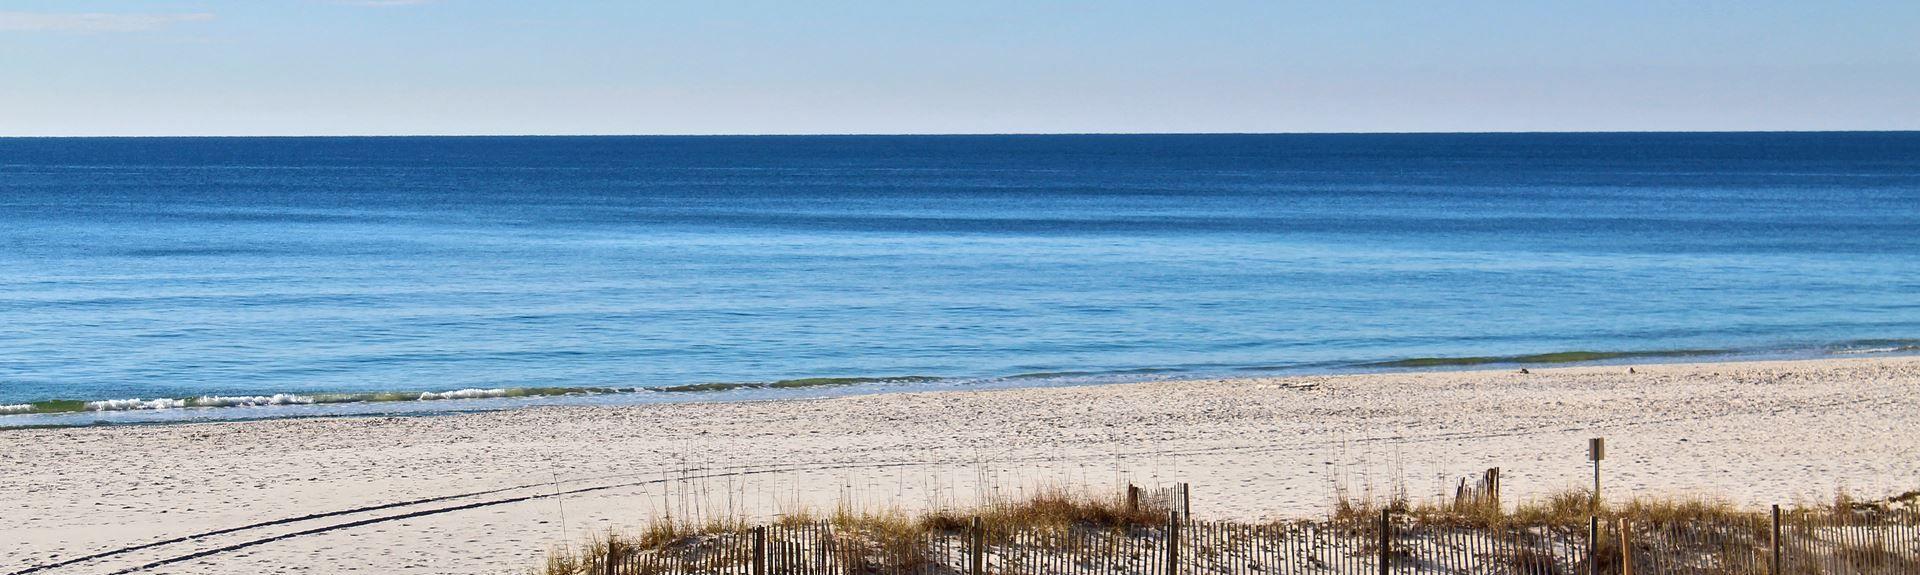 The Whaler, Gulf Shores, AL, USA